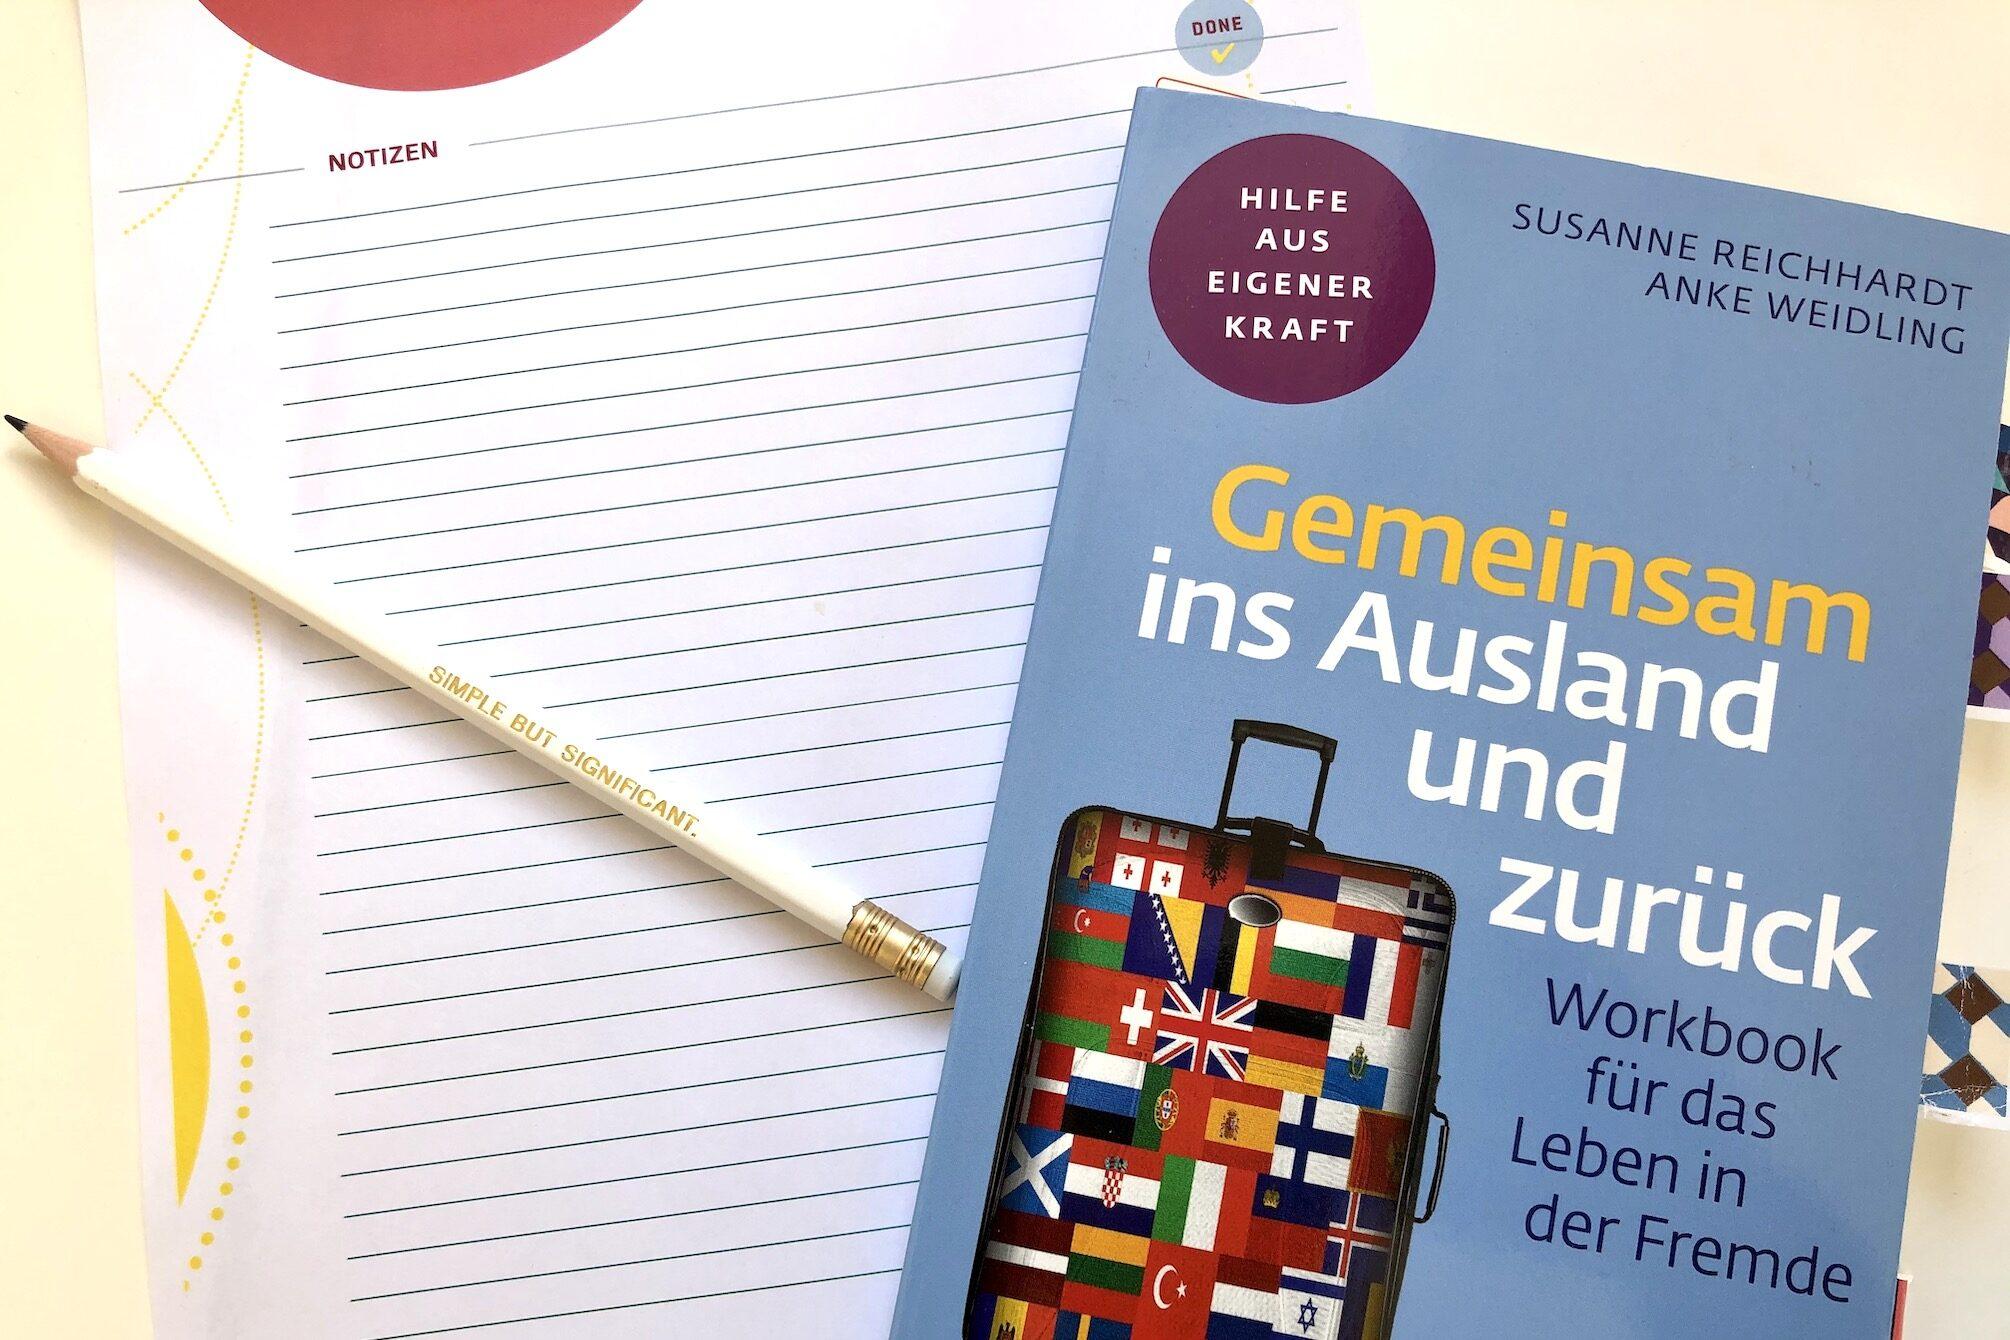 Gemeinsam ins Ausland und zurück - www.expatmamas.de/blog/ #expatmamas #buchtipp